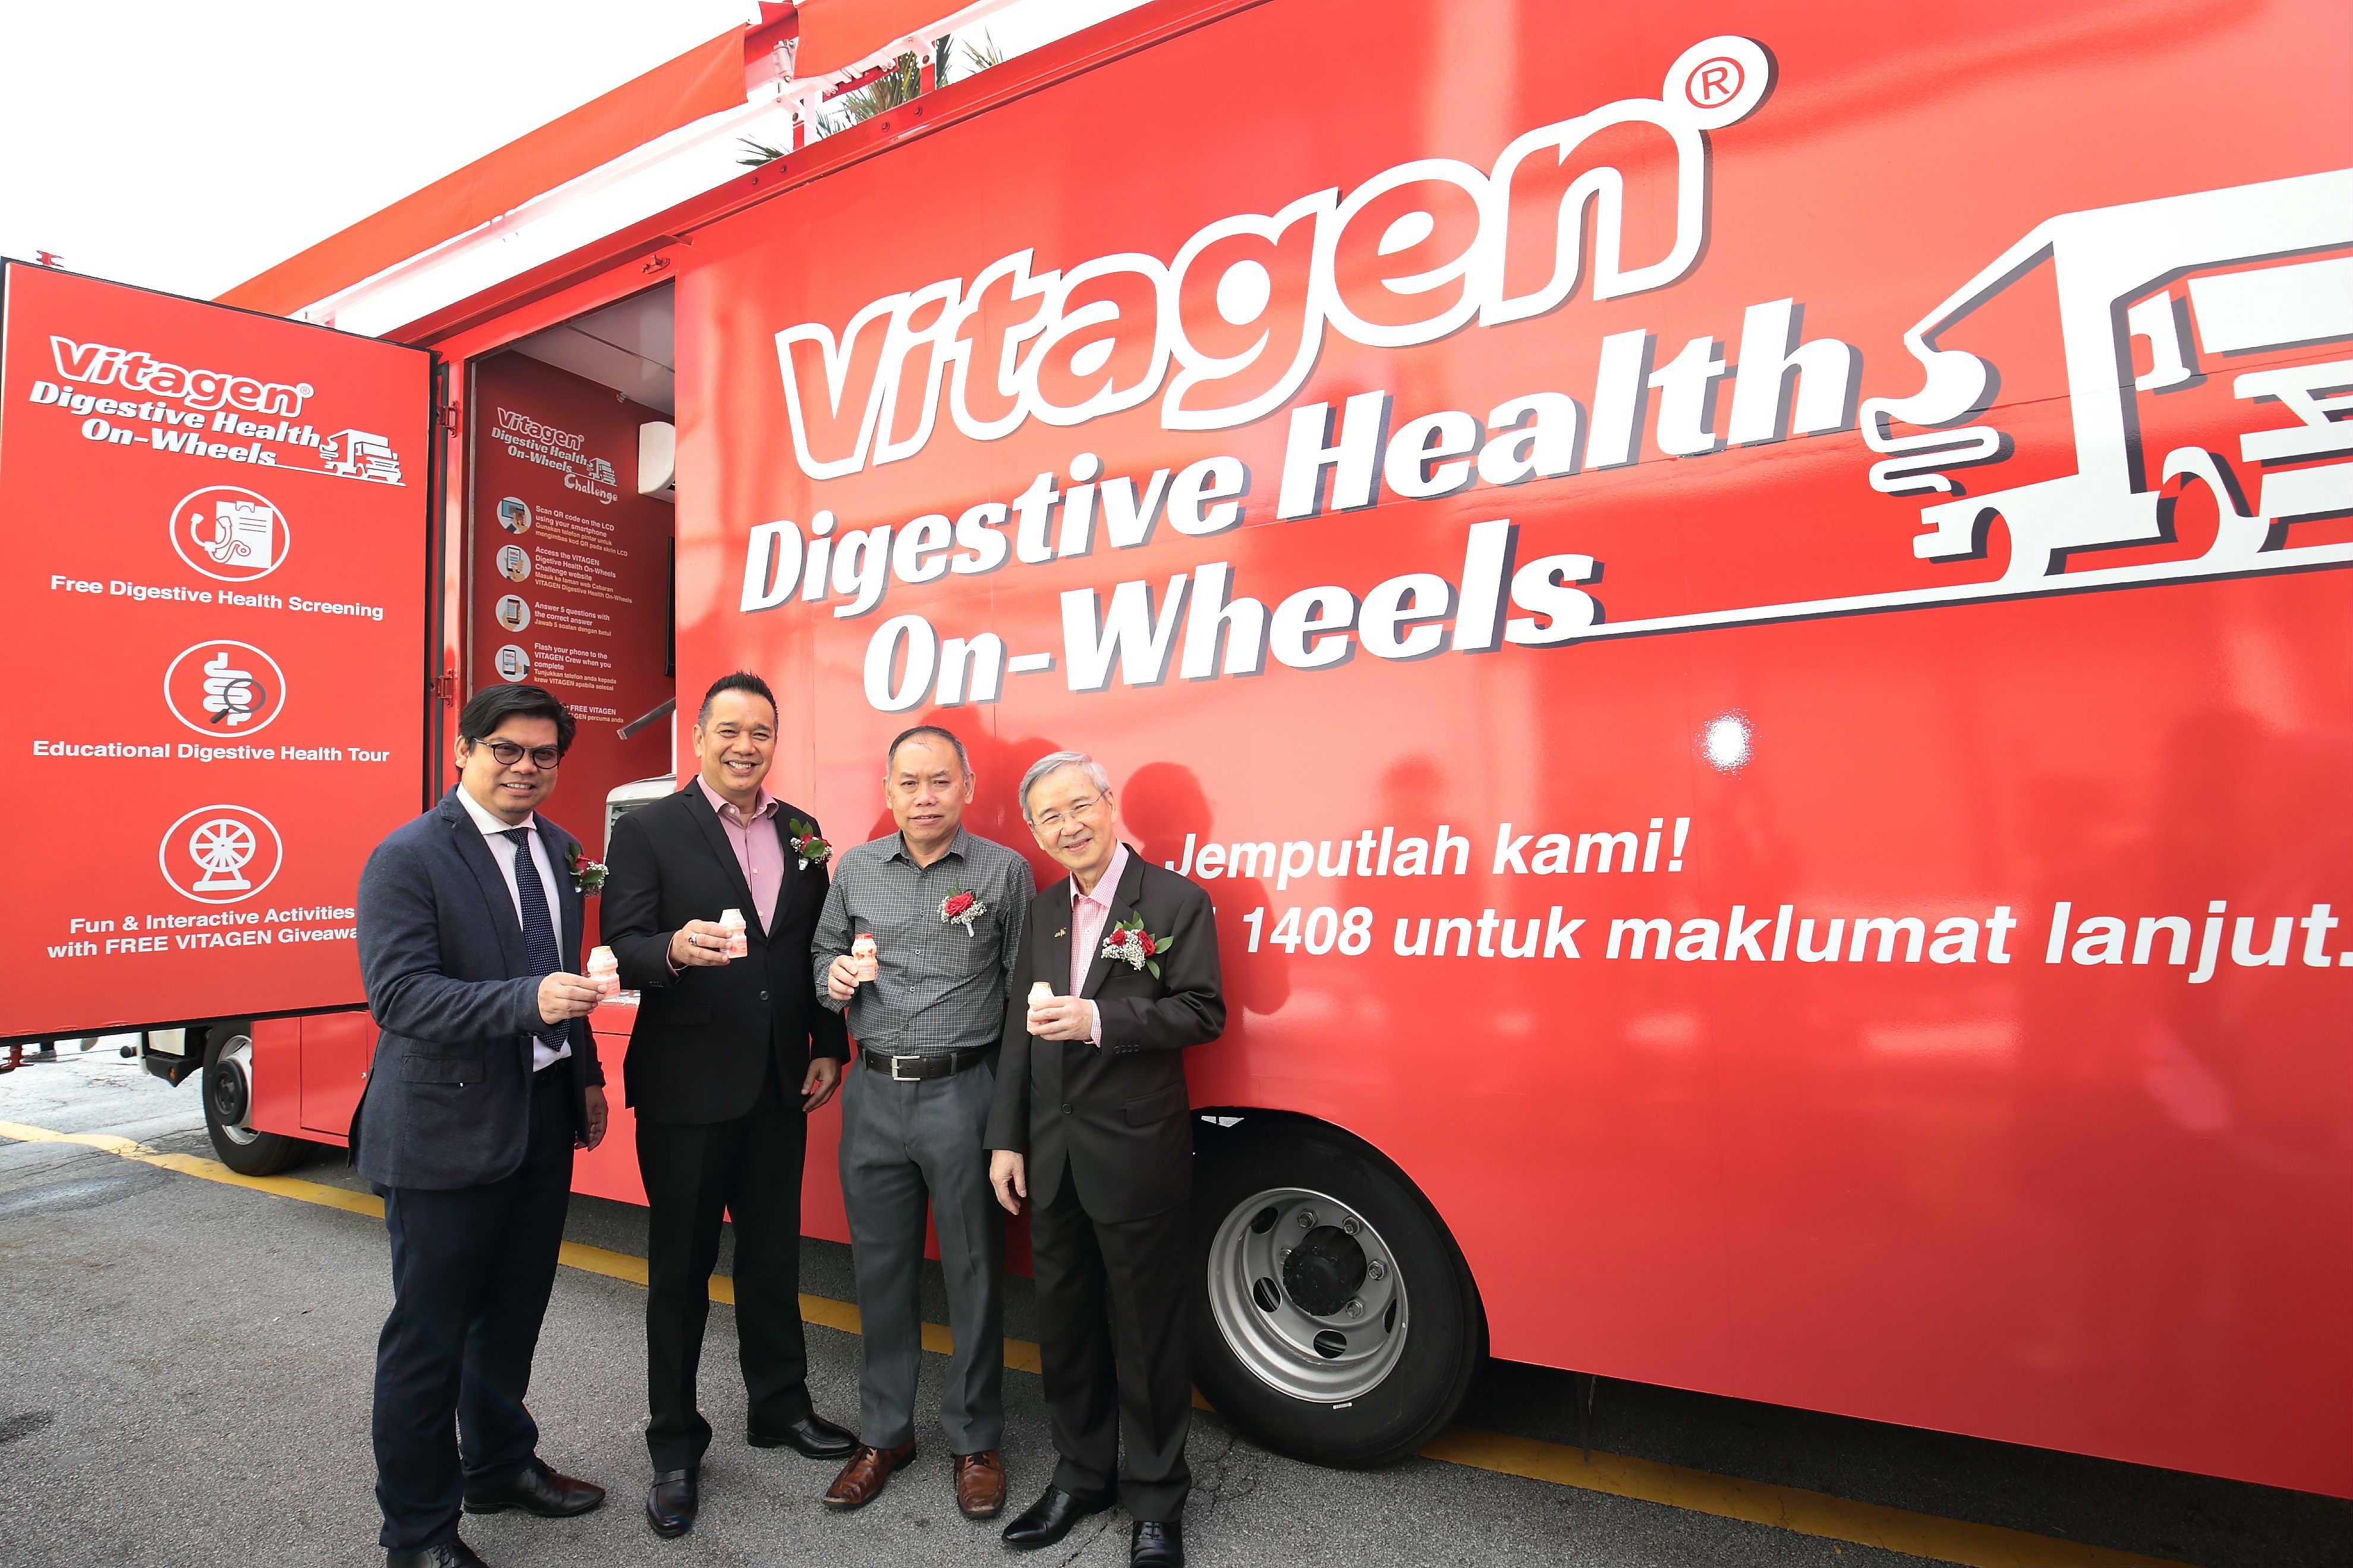 Digestive Health On-Wheels